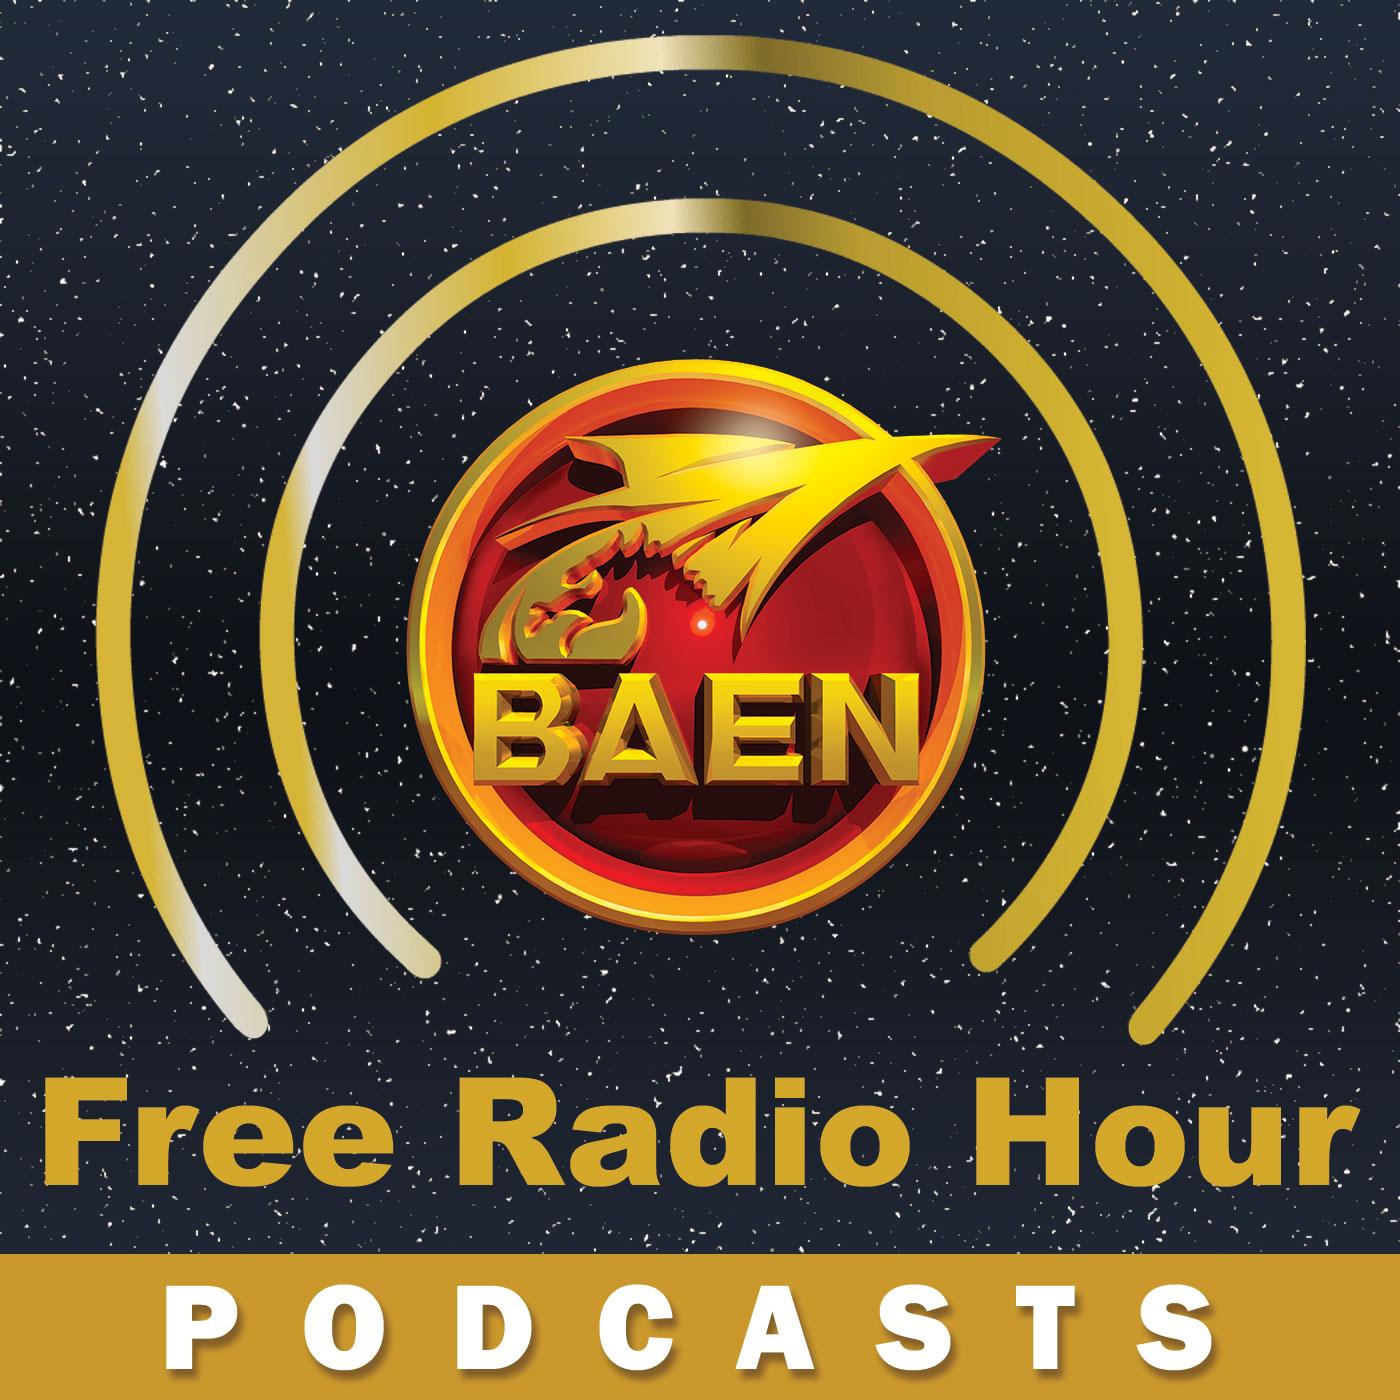 Logo for Baen Free Radio Hour Podcast.